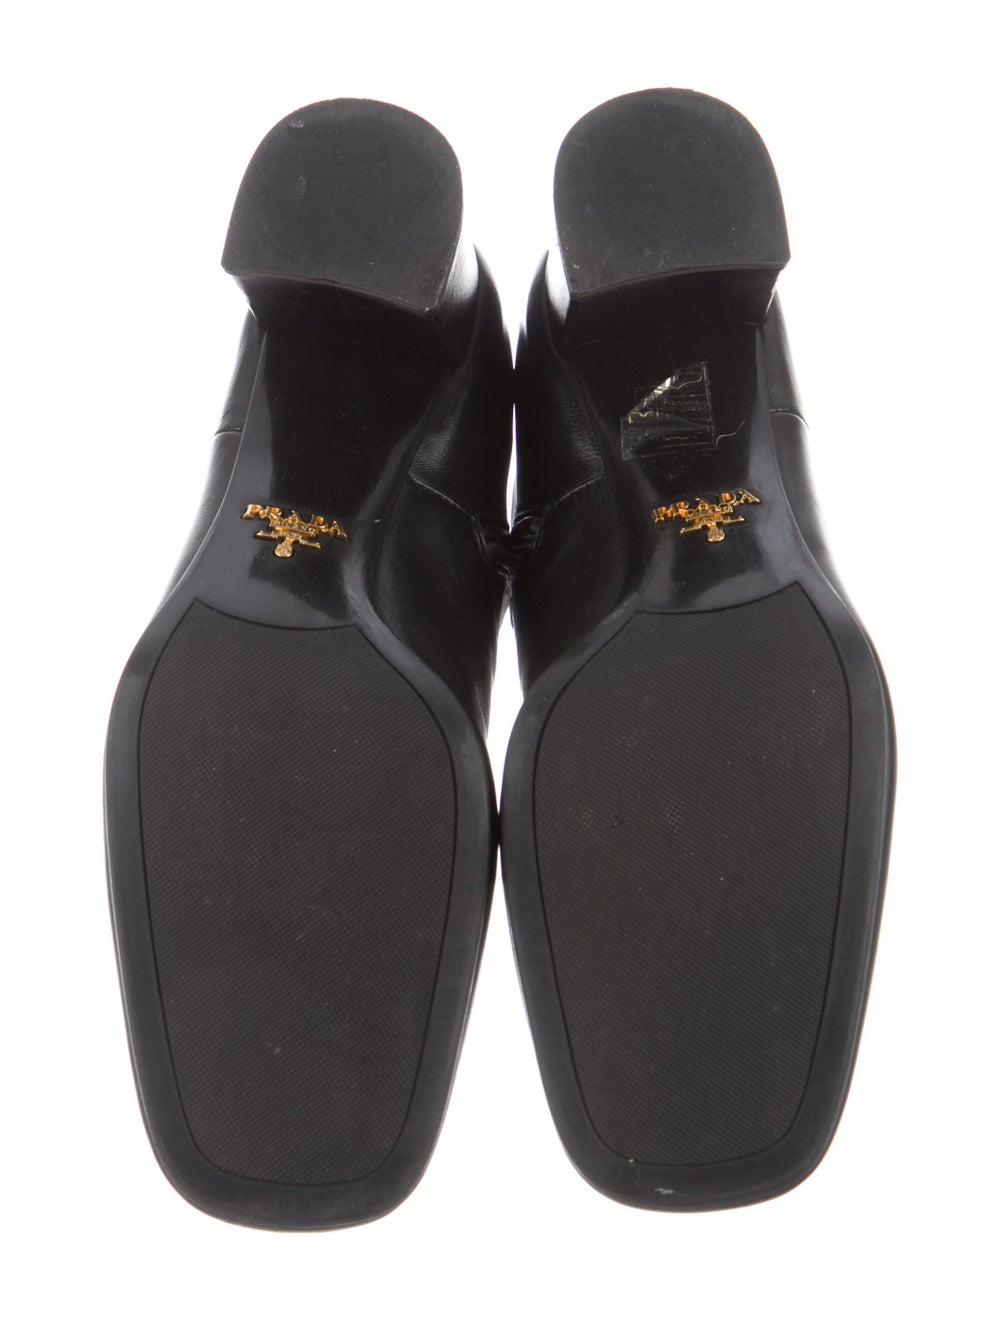 Prada Leather Boots Black - image 5